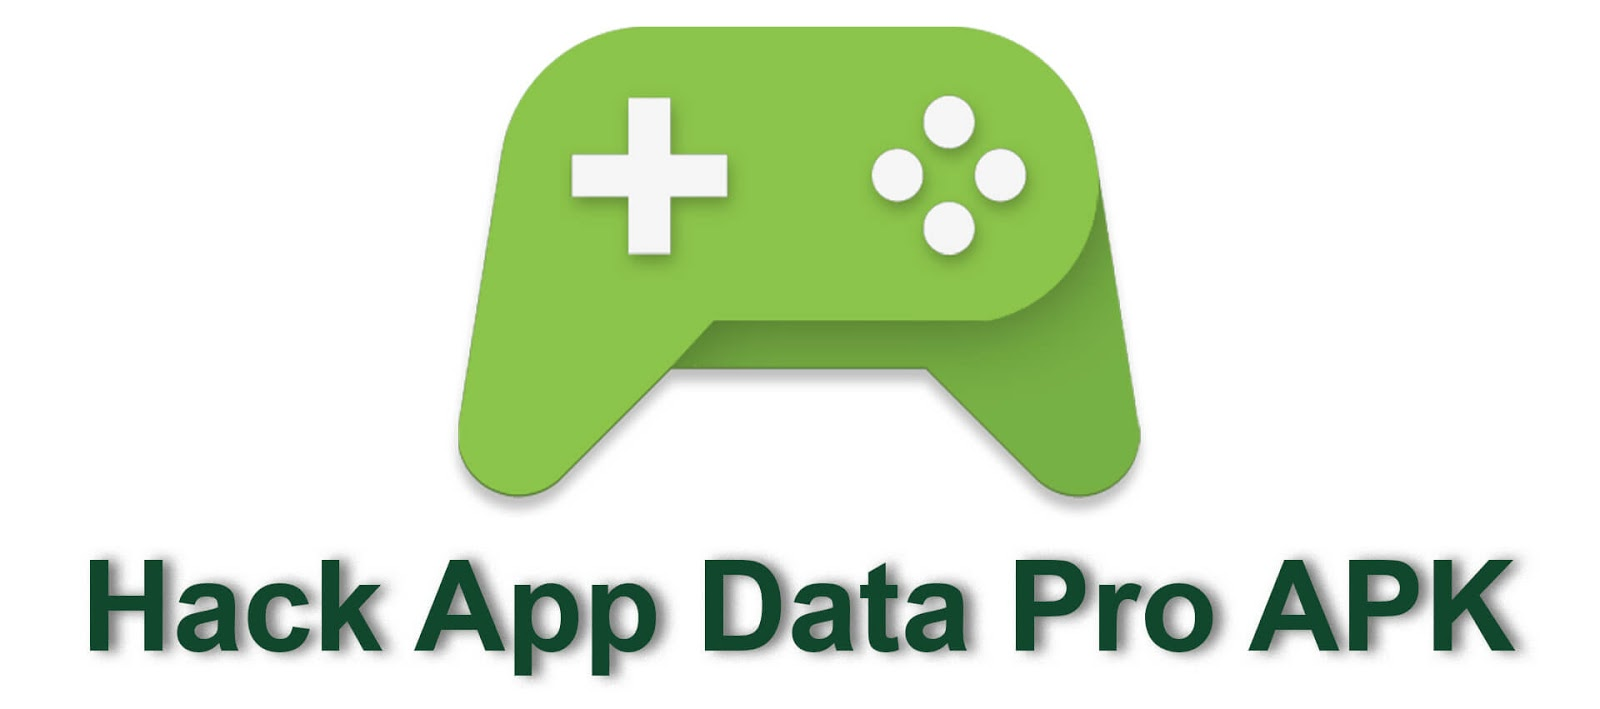 Hack App Data Pro Download APK for Android  - FreeTricks